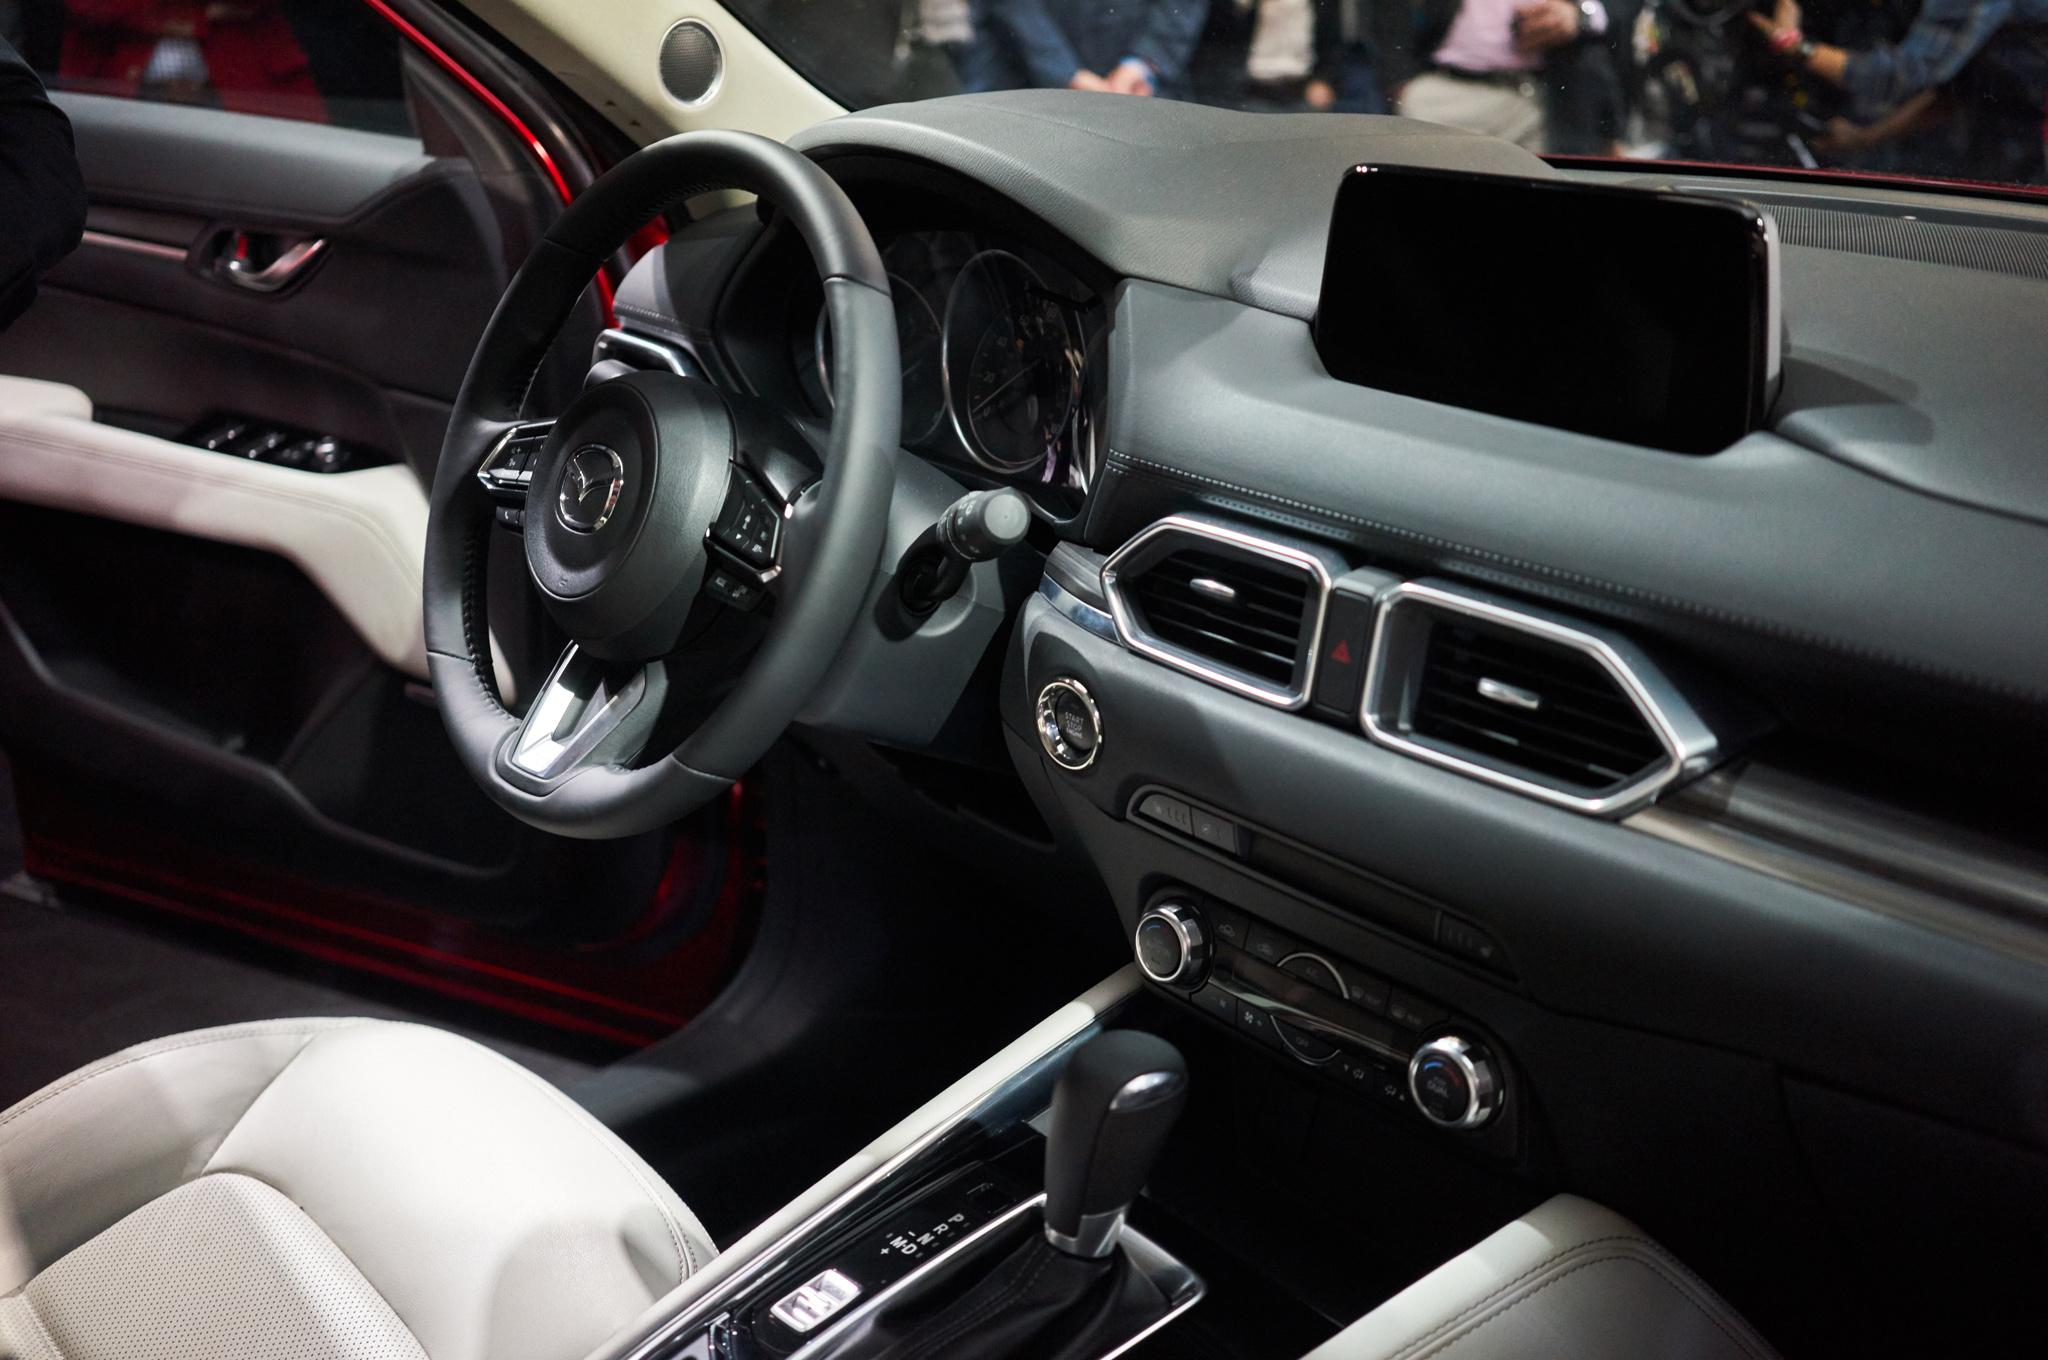 Mazda Announce Apple CarPlay For Old and Upcoming Models – CarPlay ...